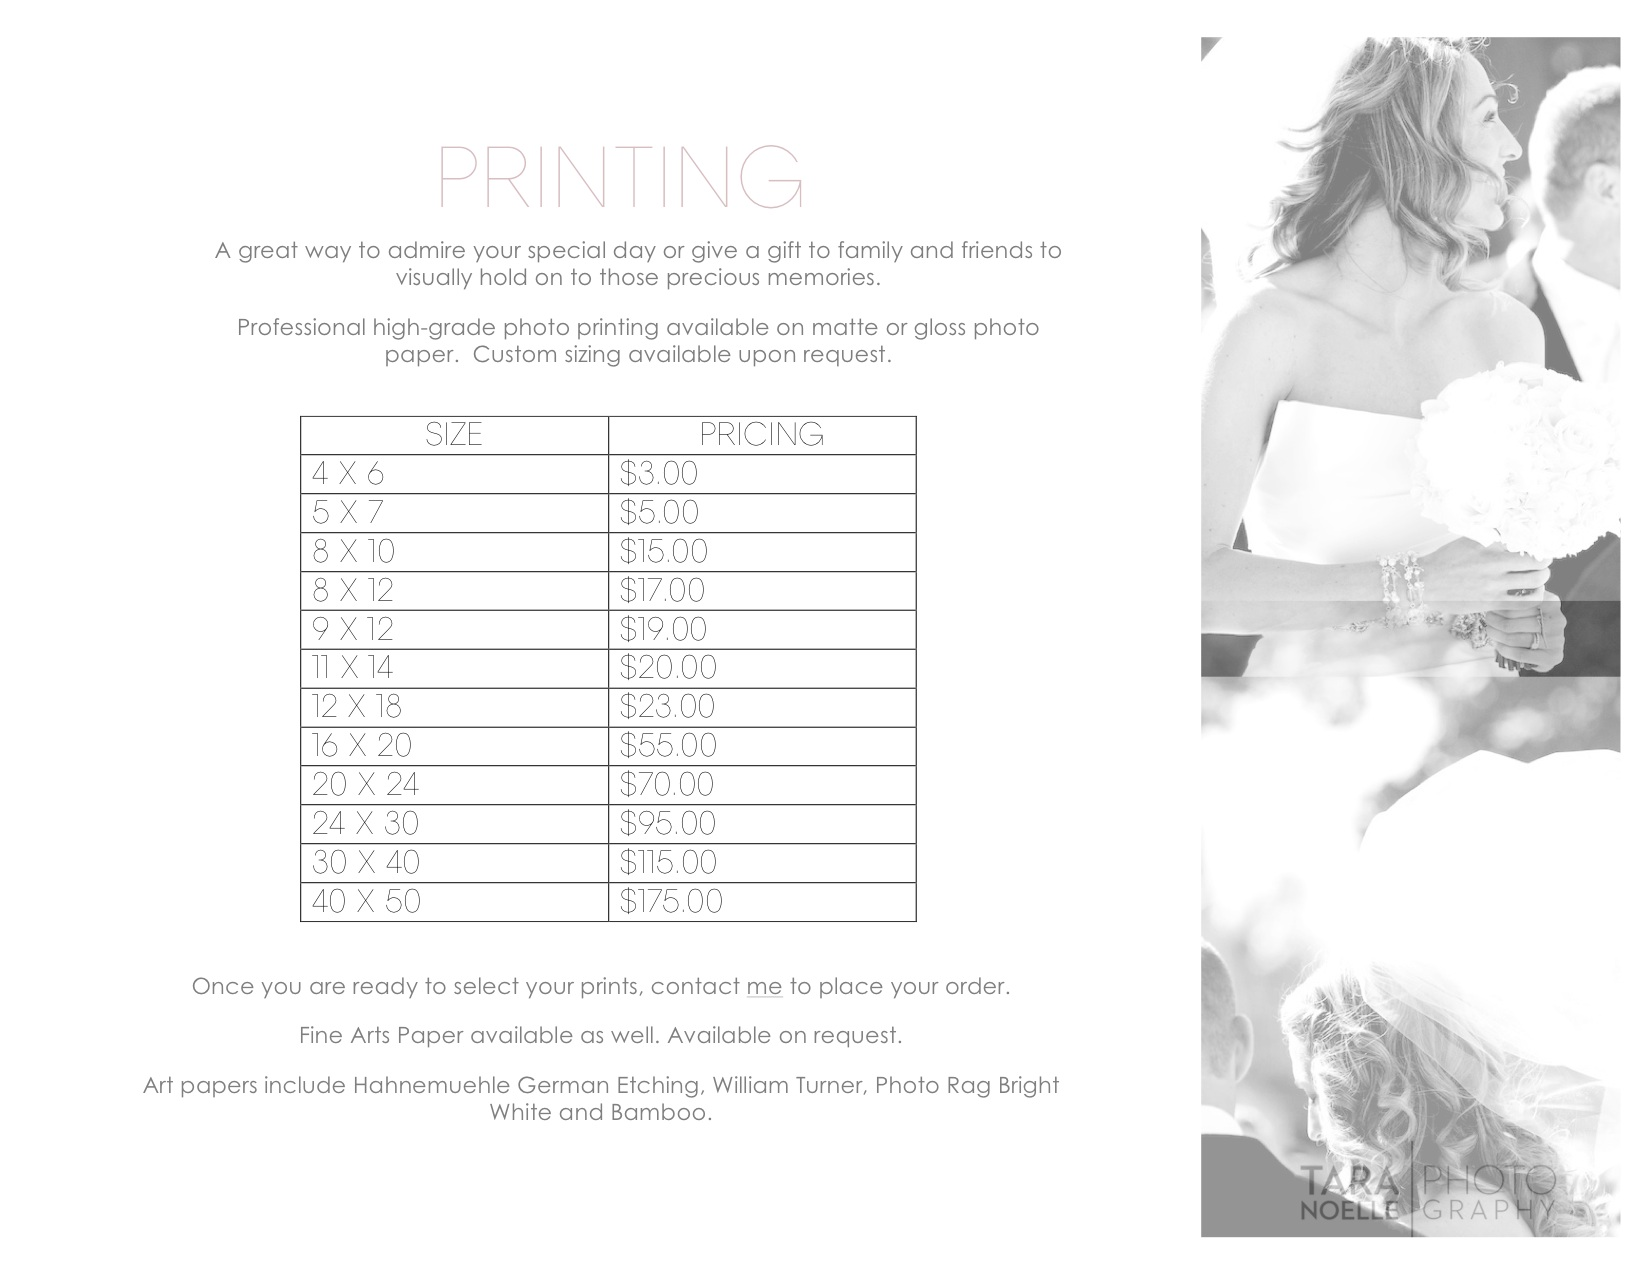 Tara Noelle Photography l Wedding Packages l 2013 4.jpg